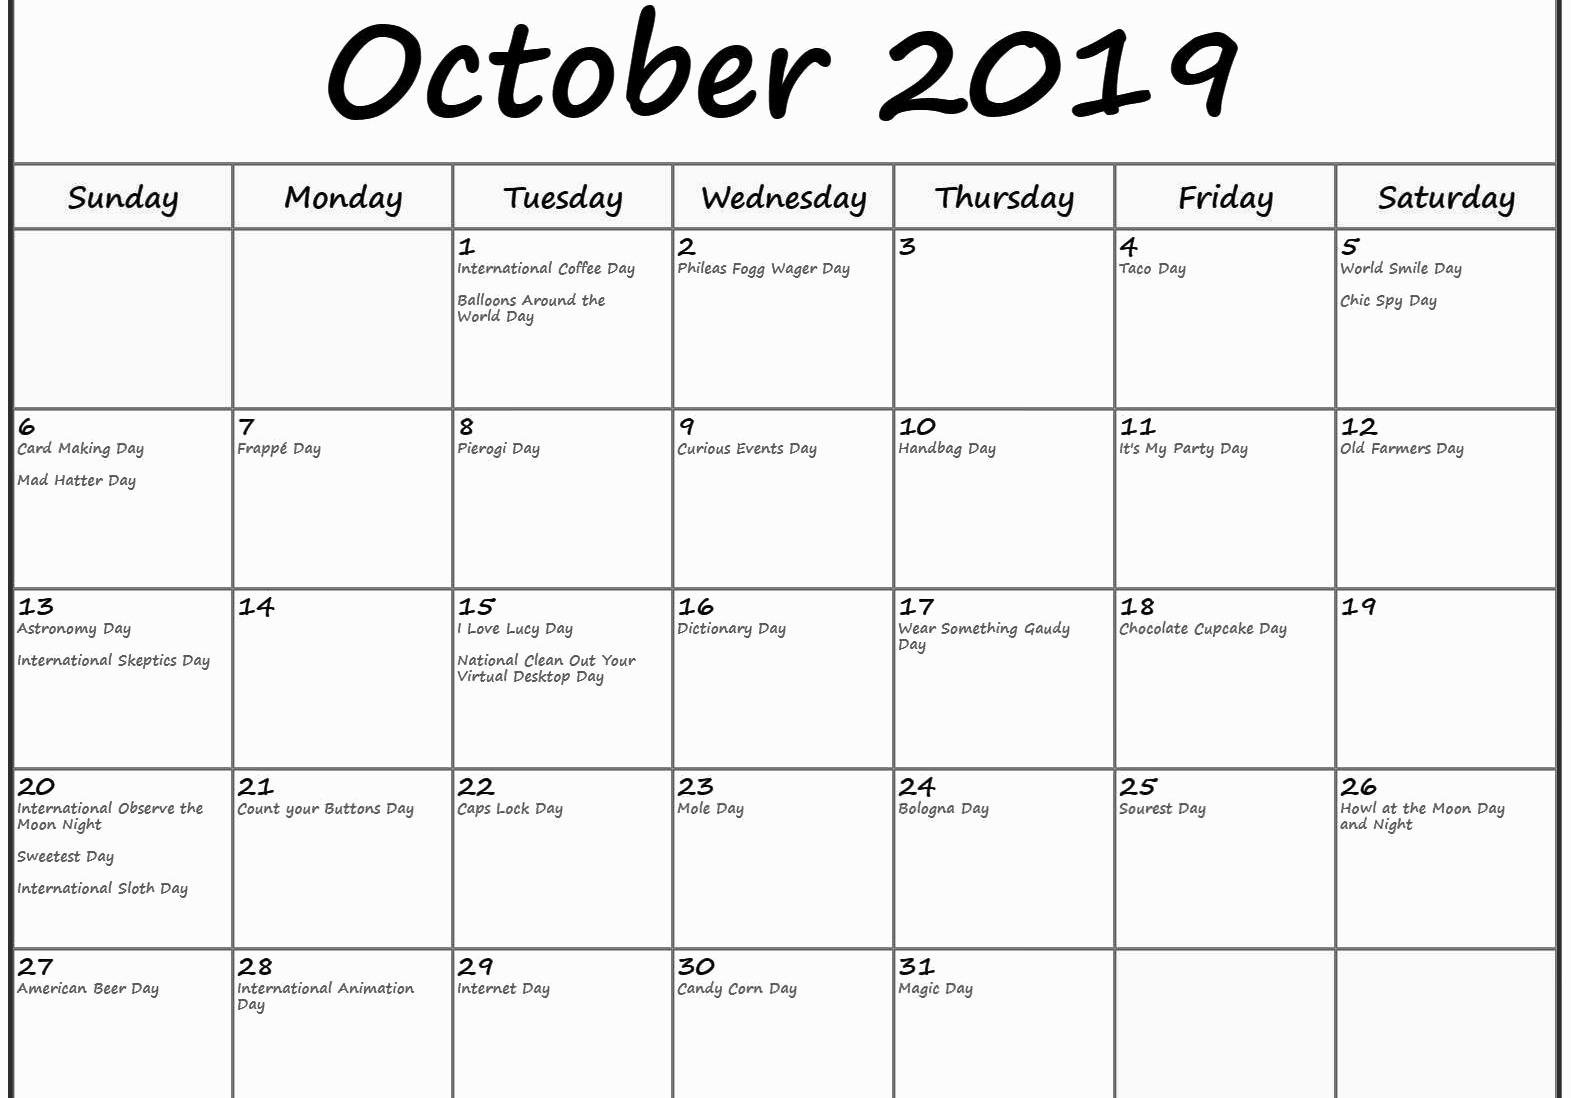 October 2019 Calendar with Holidays India